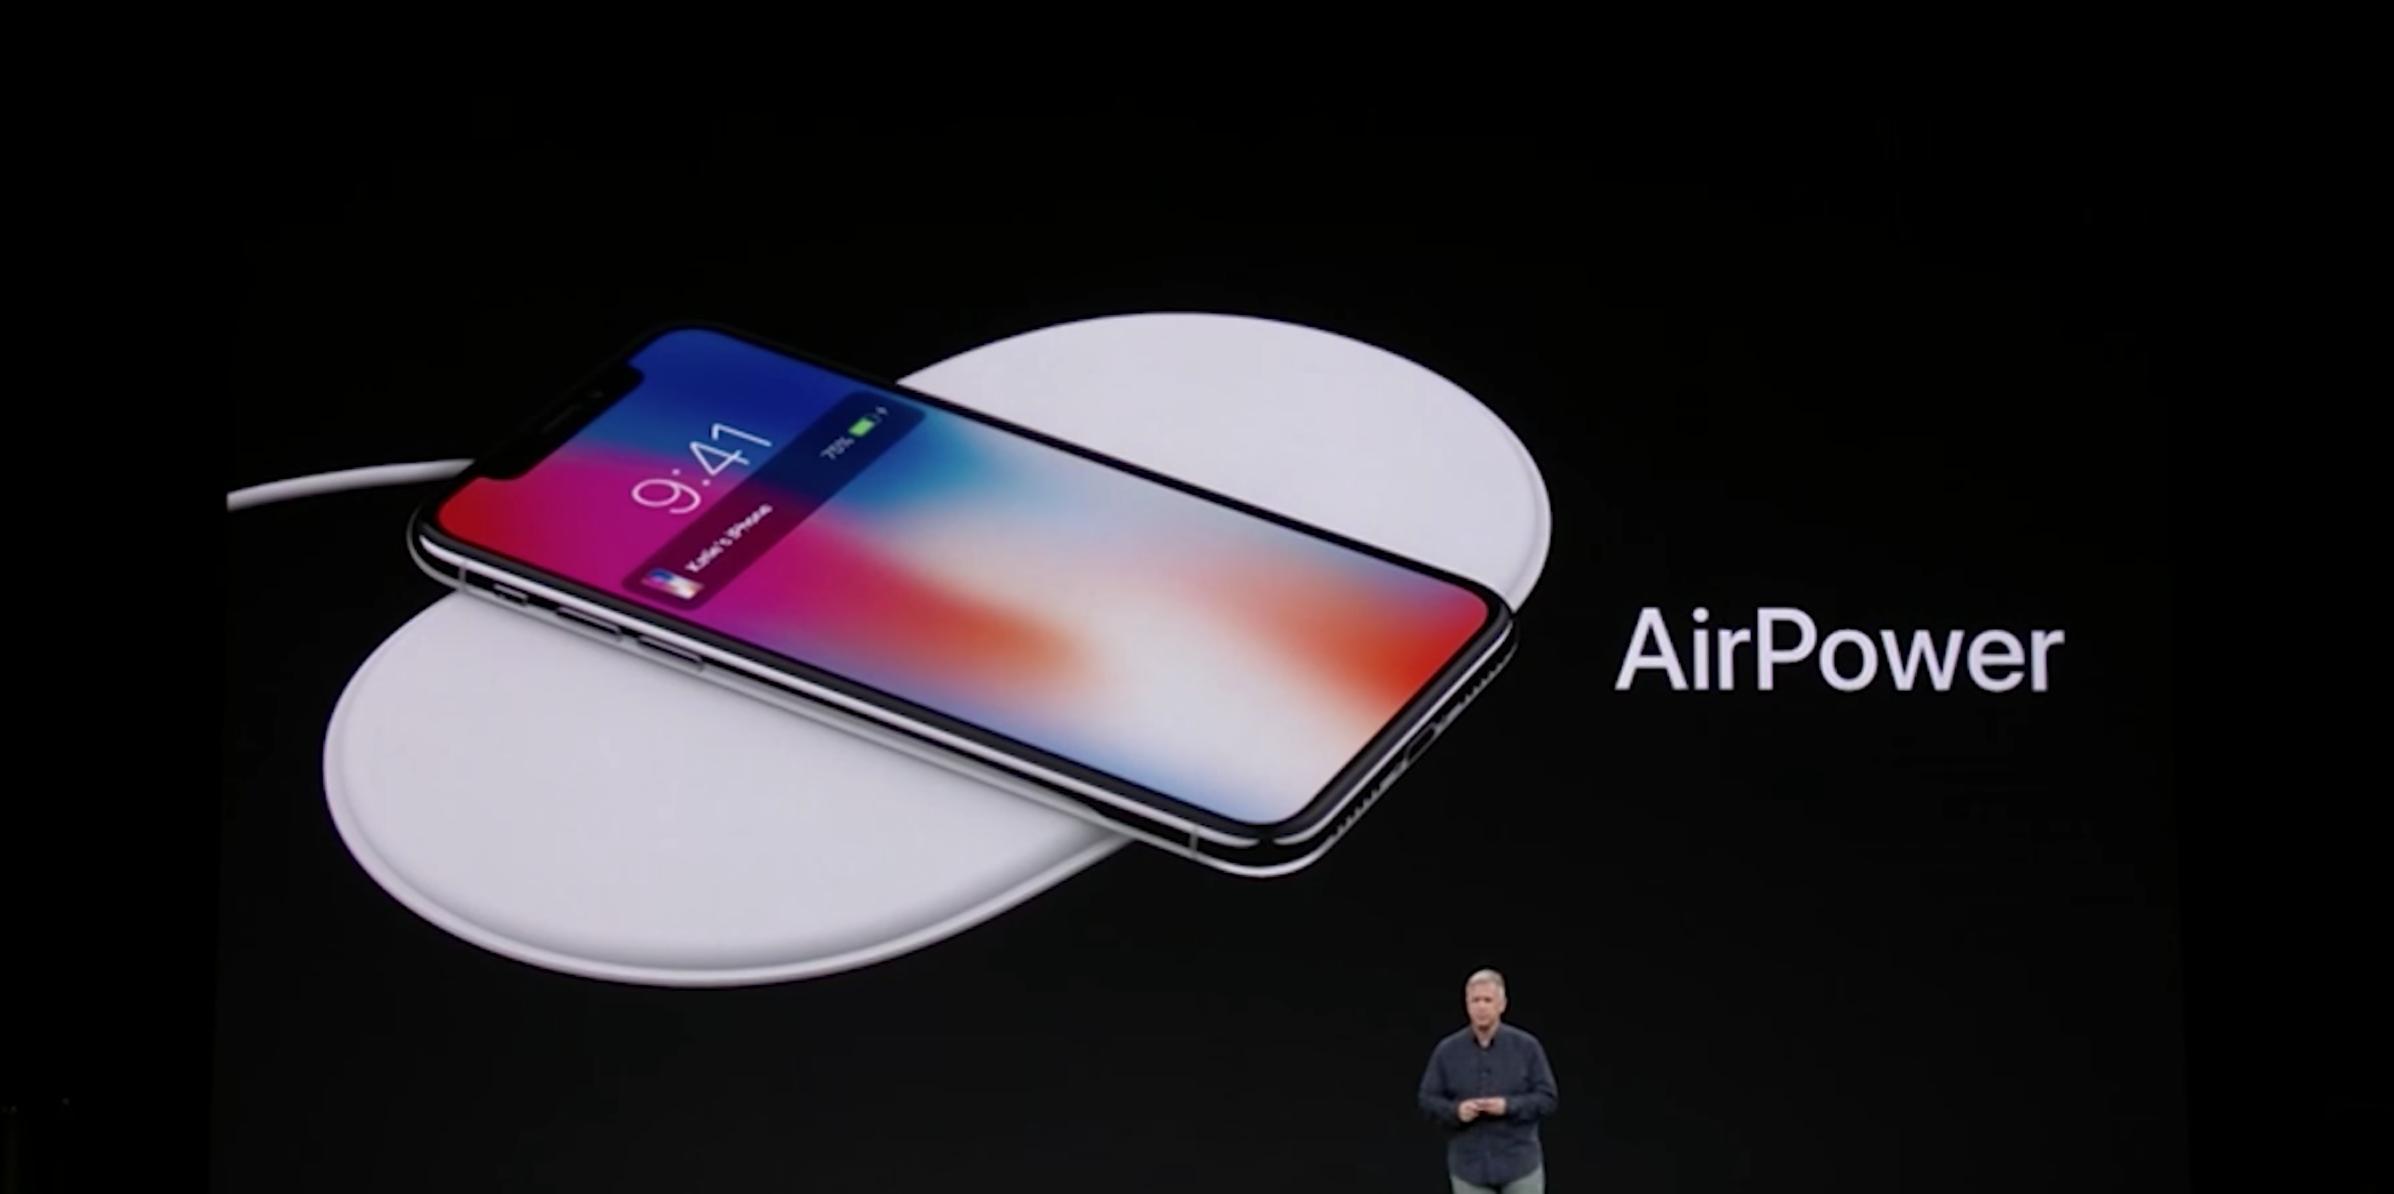 iPhone X 2018 le câble adaptateur lightning jack non fourni